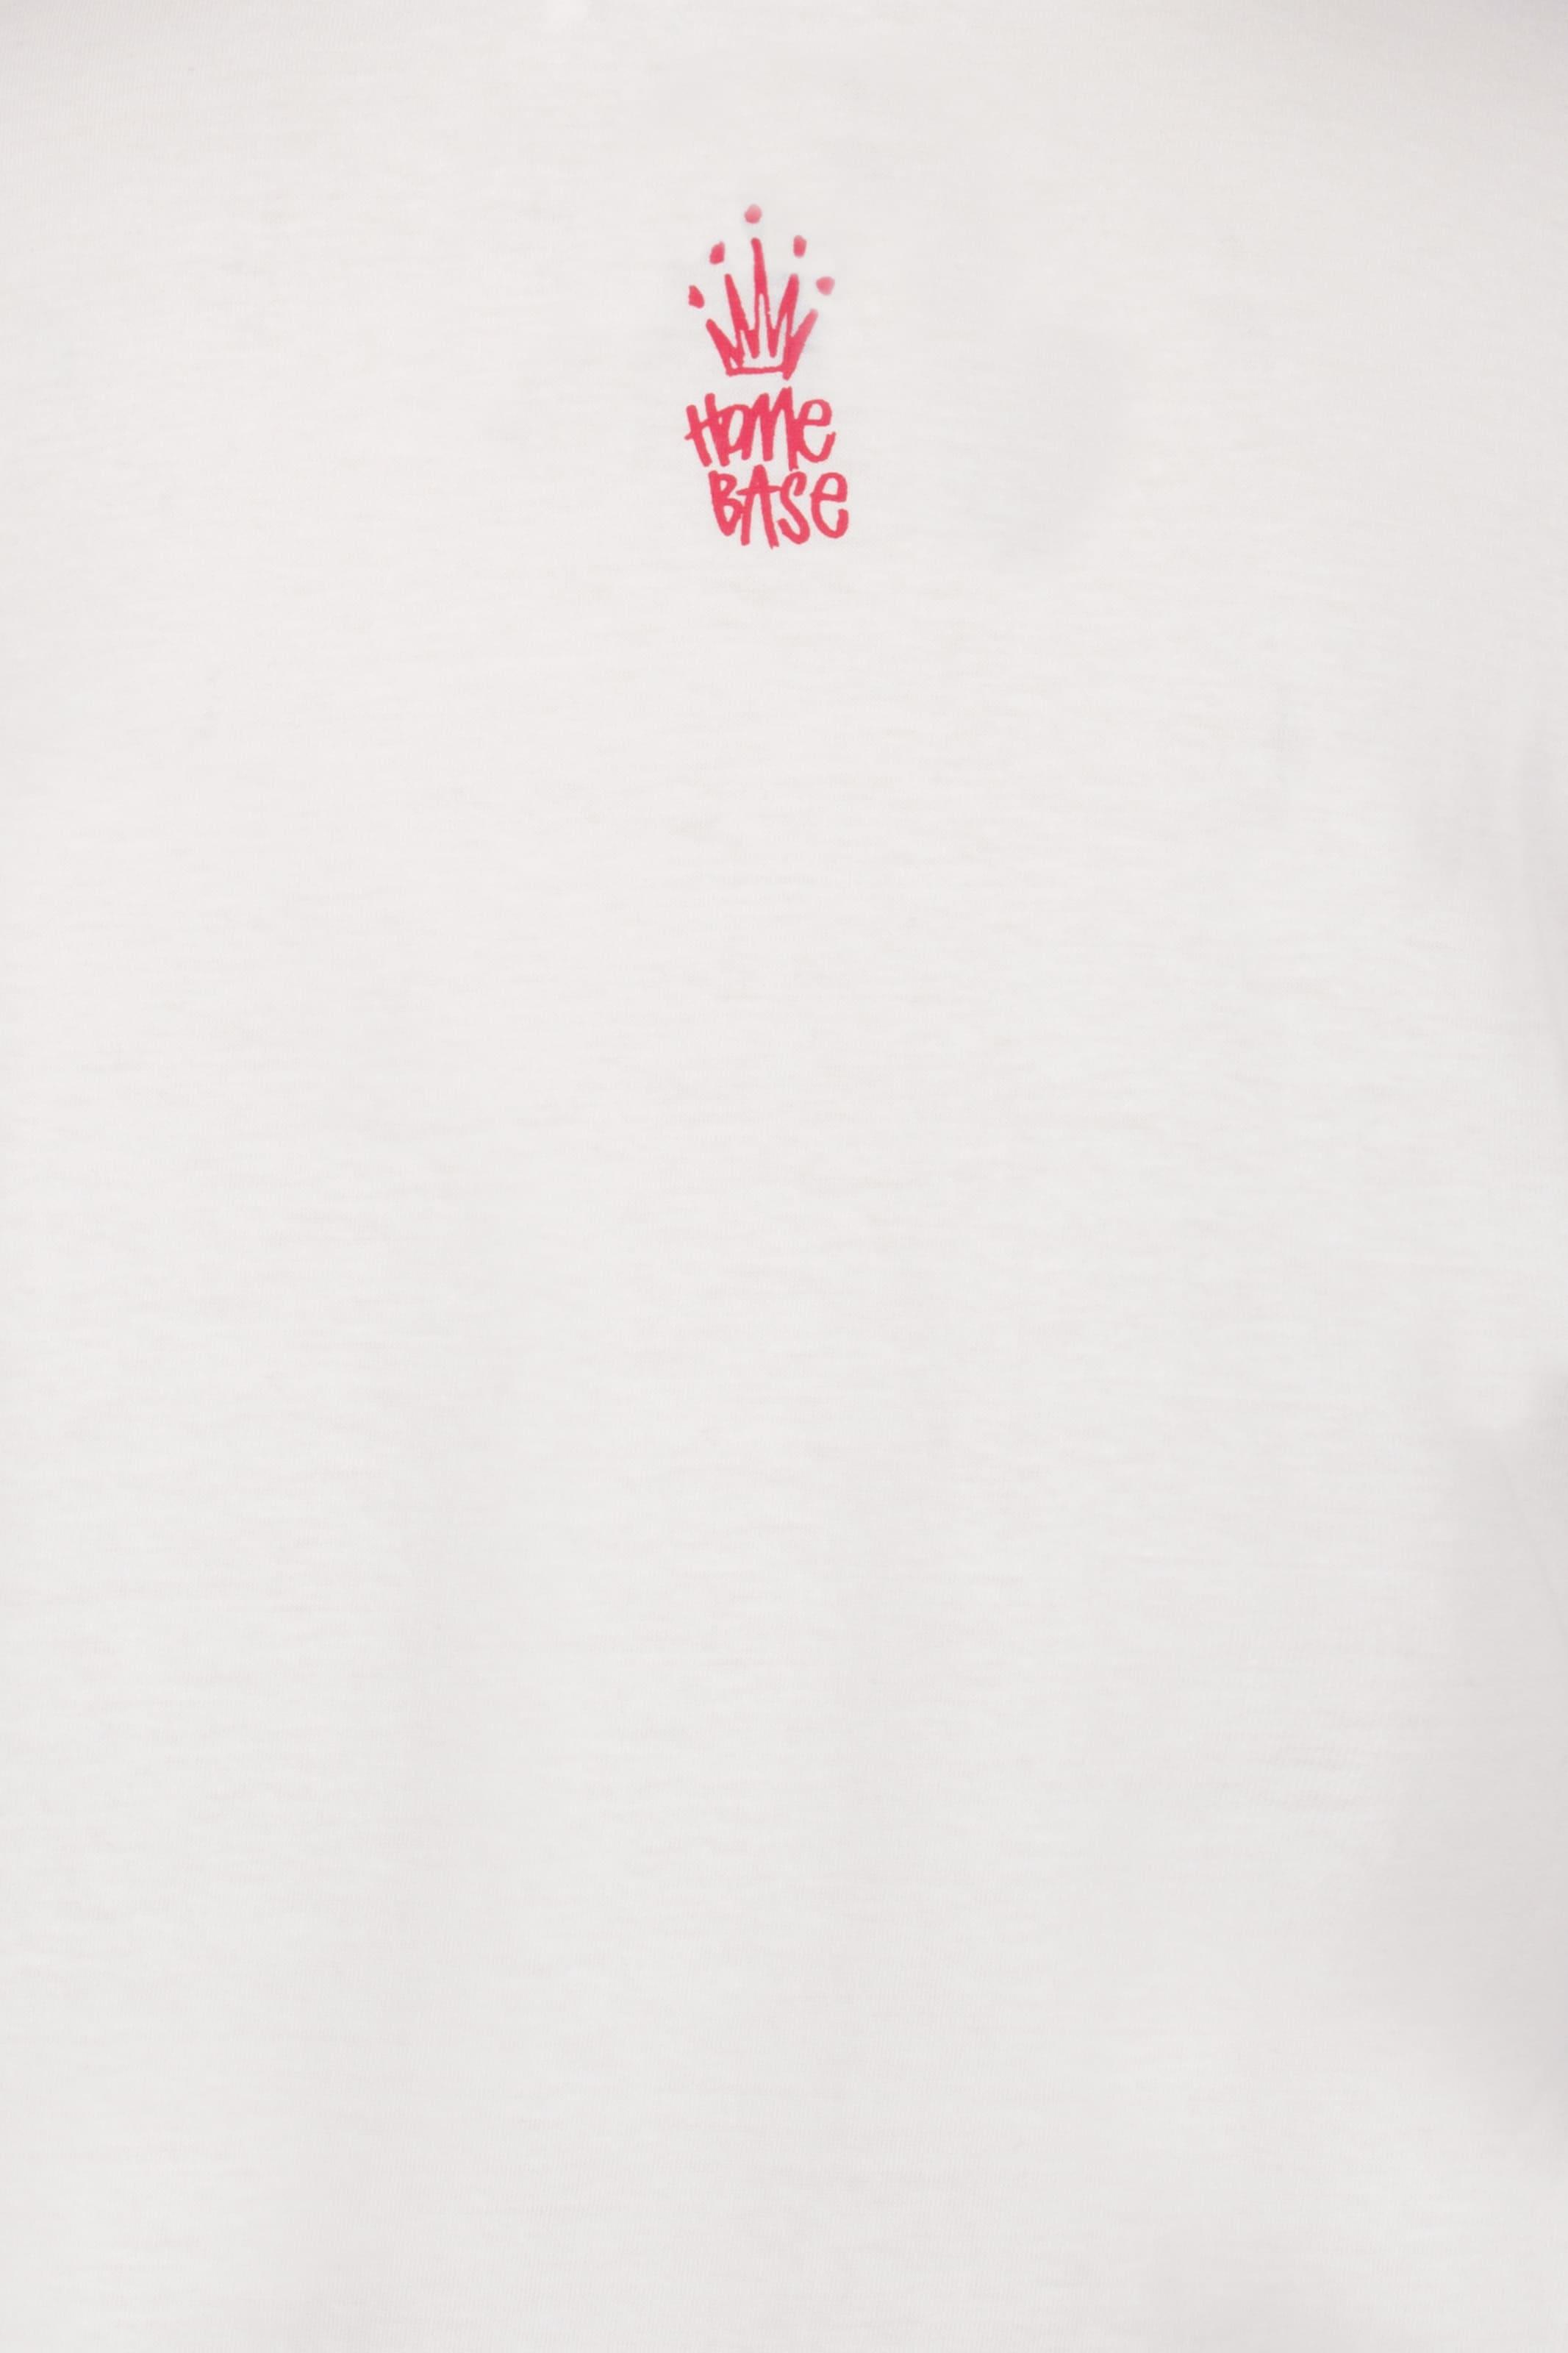 T En Homebase Blanc shirt By Homebase' 'brandalised A3LqcR54j